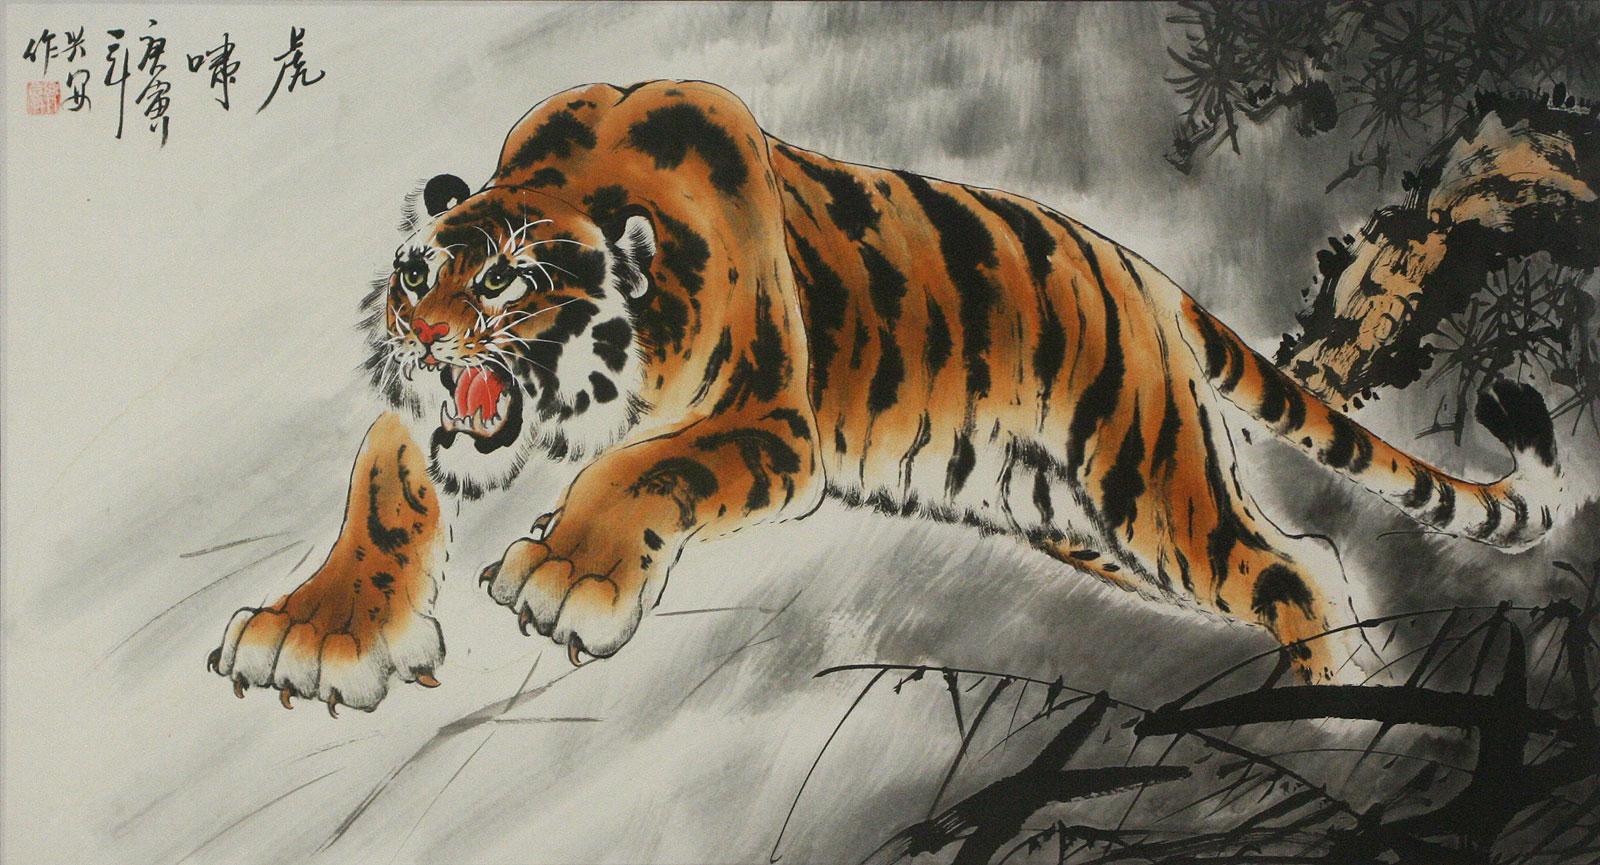 Ancient chinese tiger drawing - photo#27